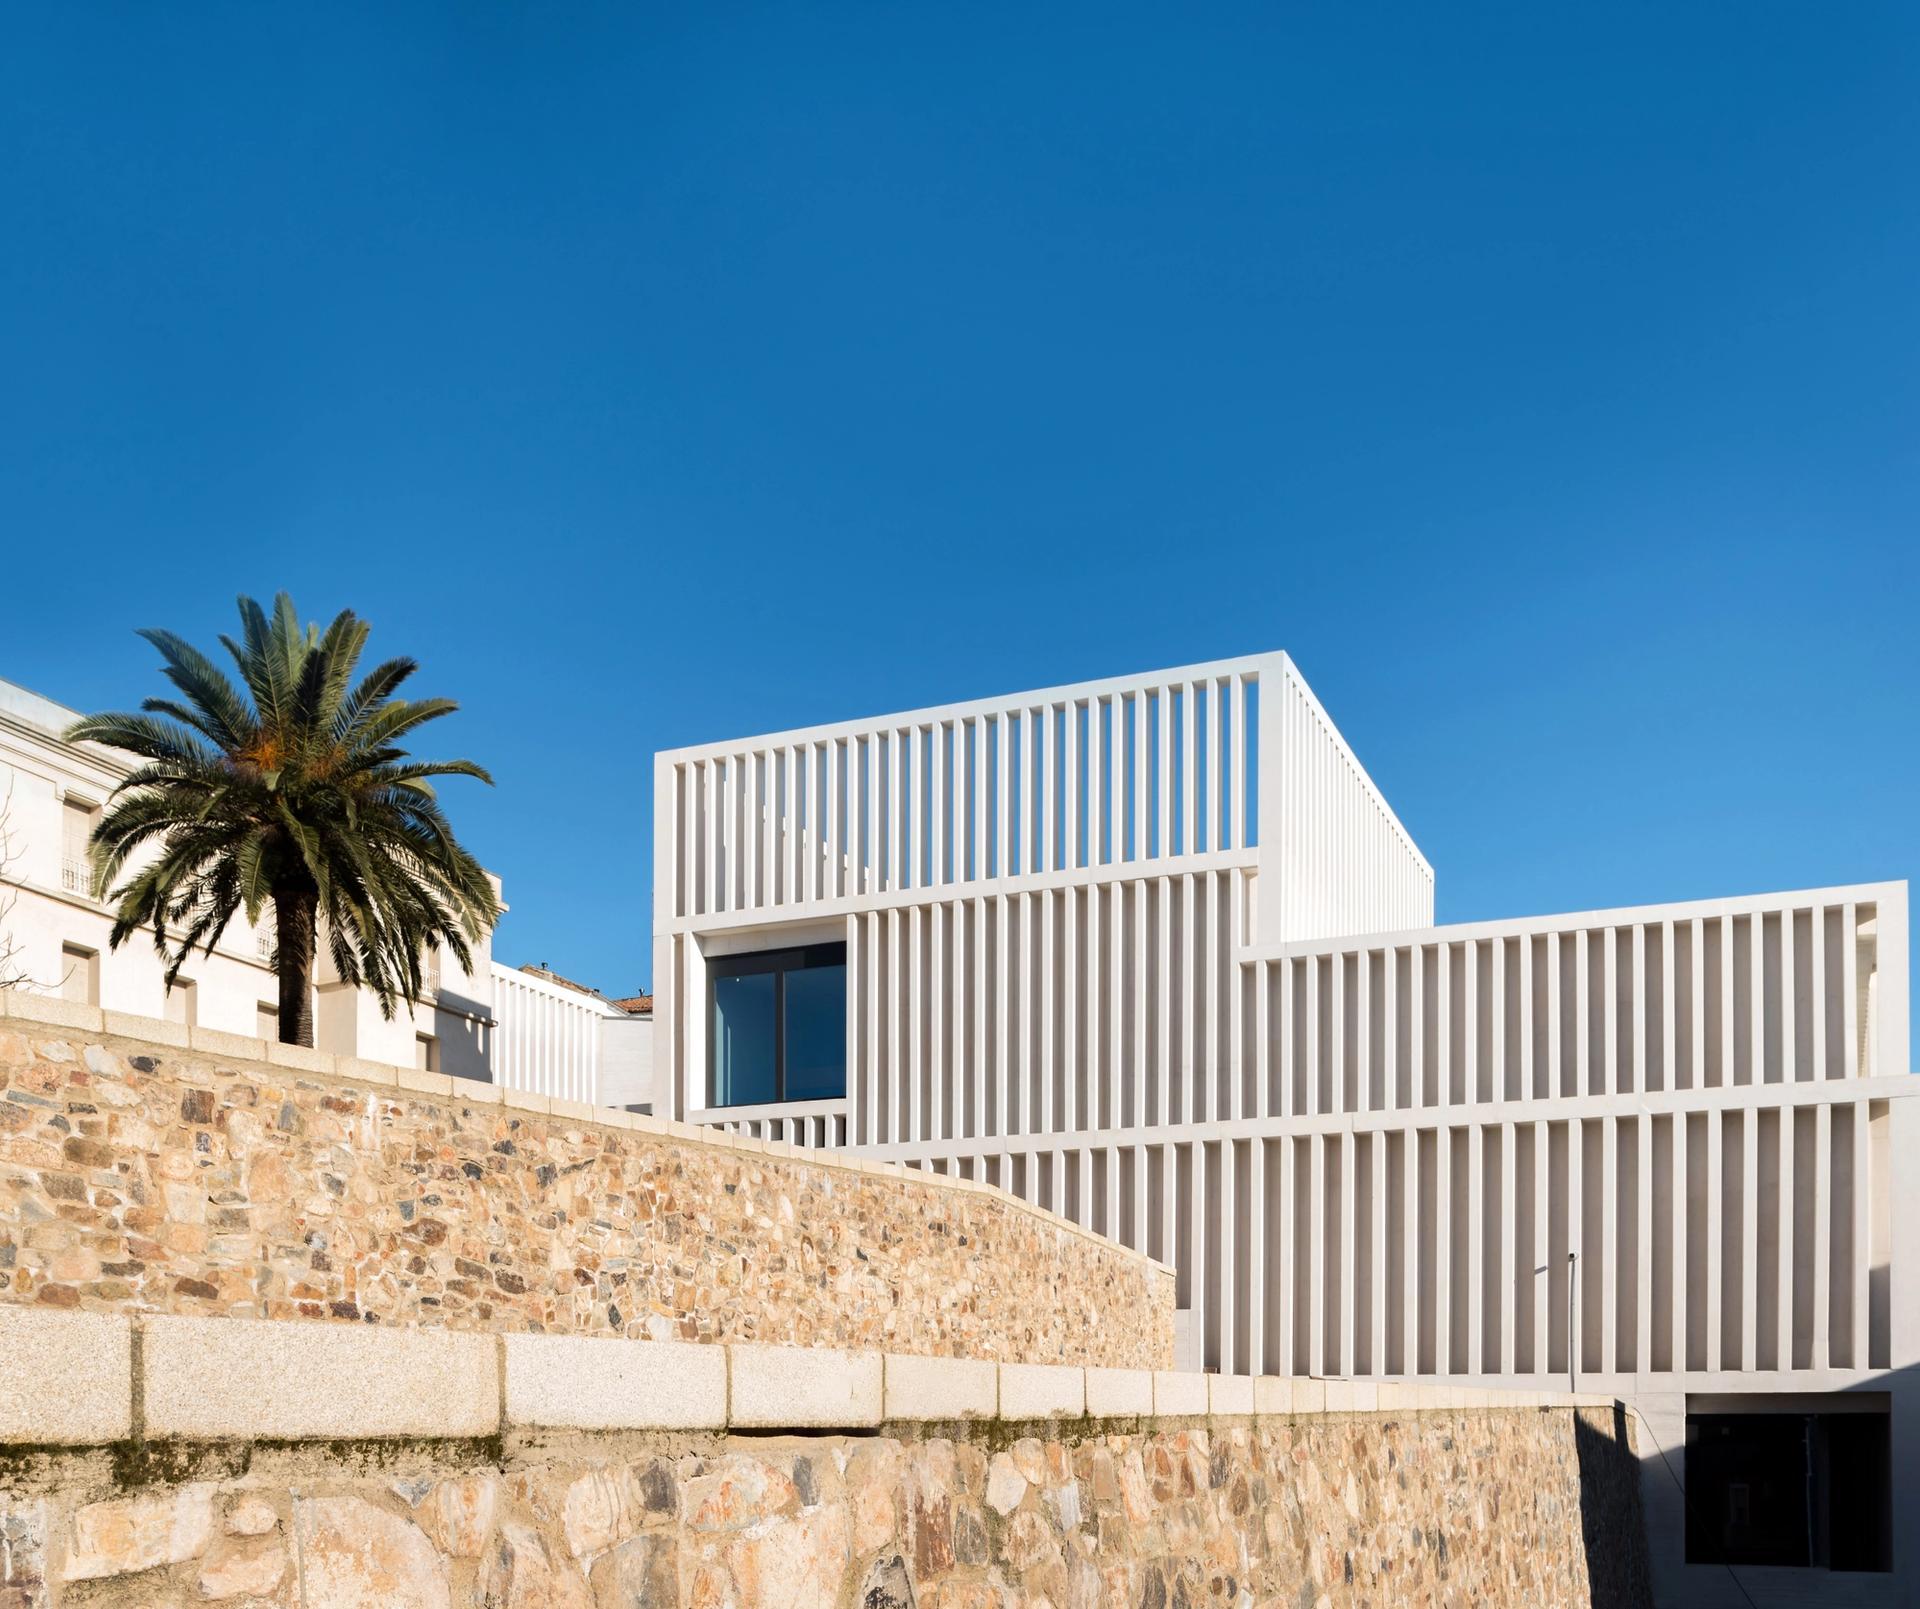 The Museum of Contemporary Art Helga de Alvear Photo: Amores Pictures